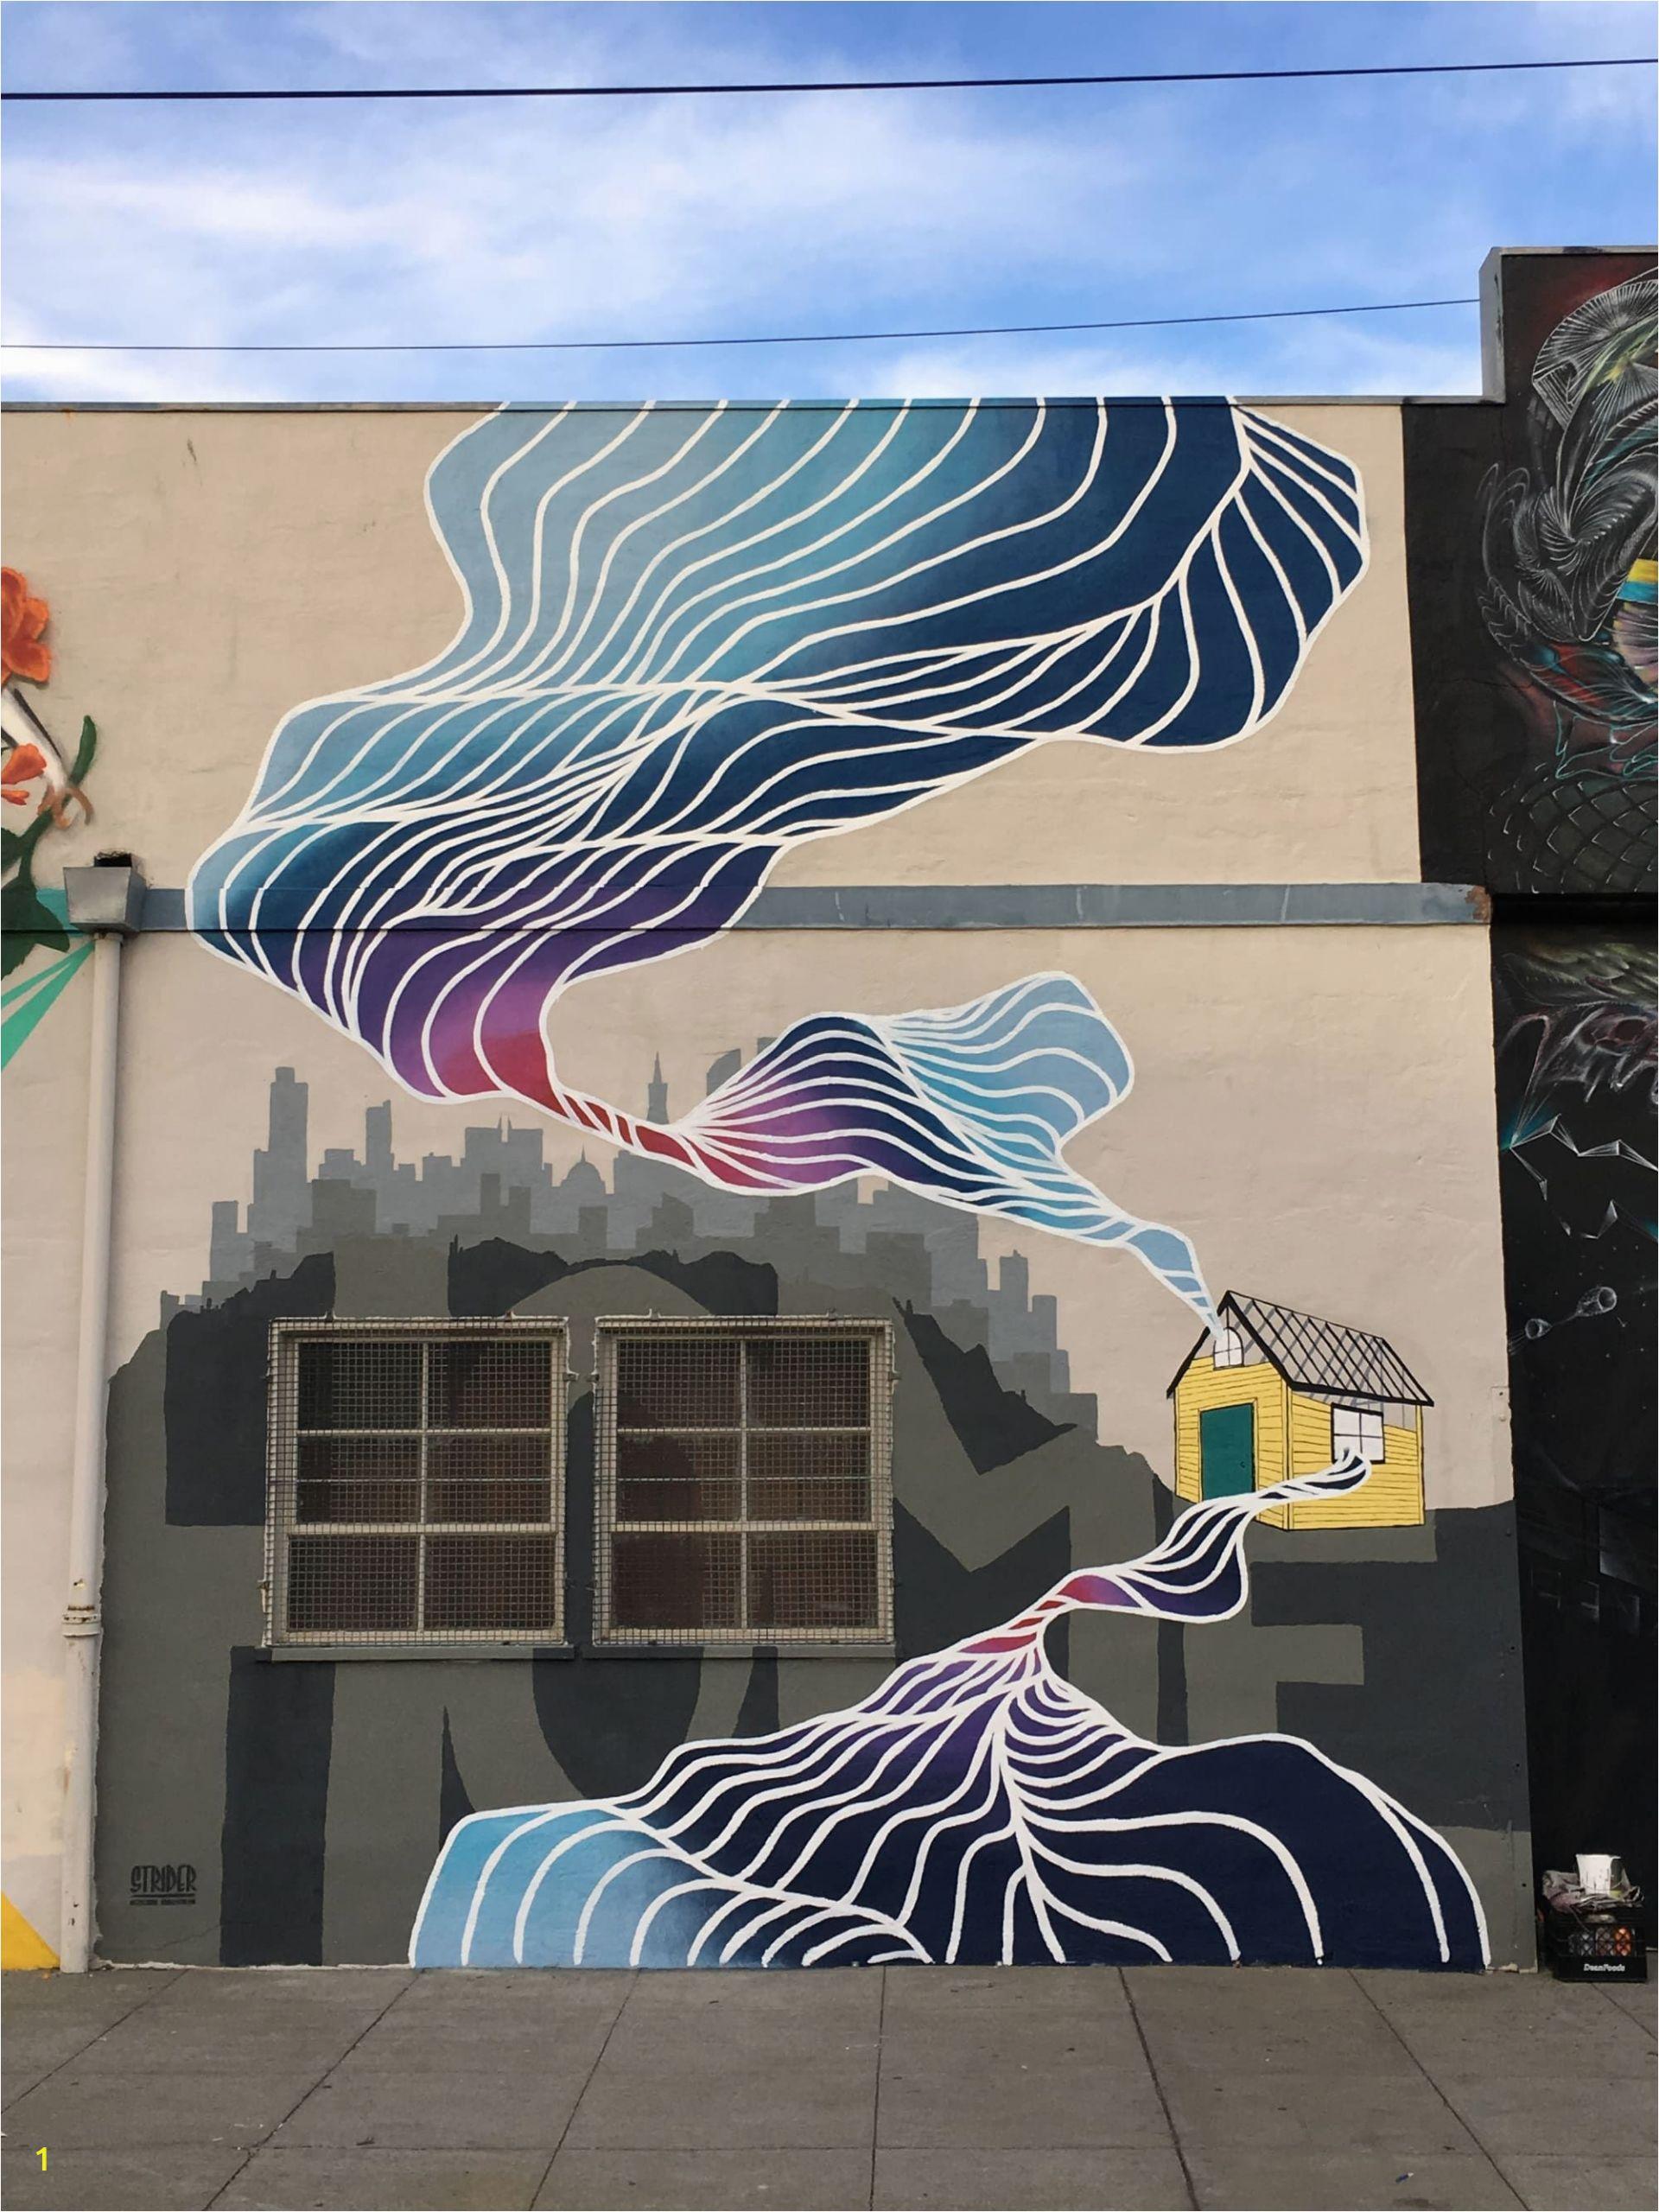 San Francisco Wall Mural Street Murals Building Home In 2019